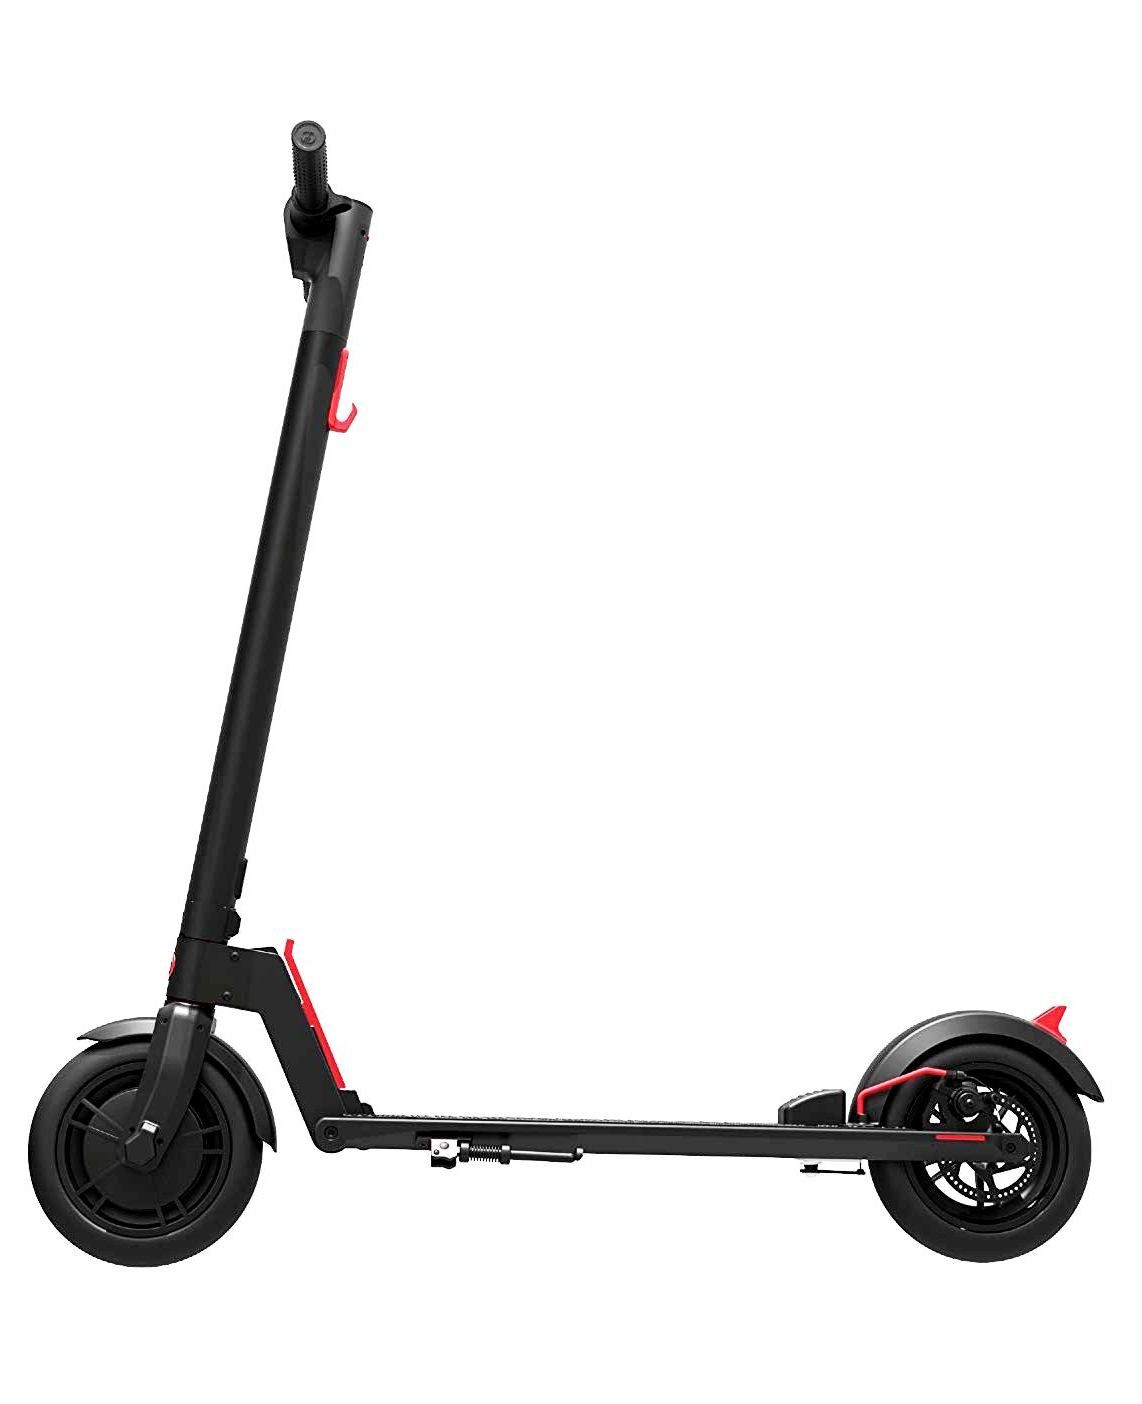 Fast Electric Scooter >> Fastest Electric Scooter Fastest Electric Scooter 2019